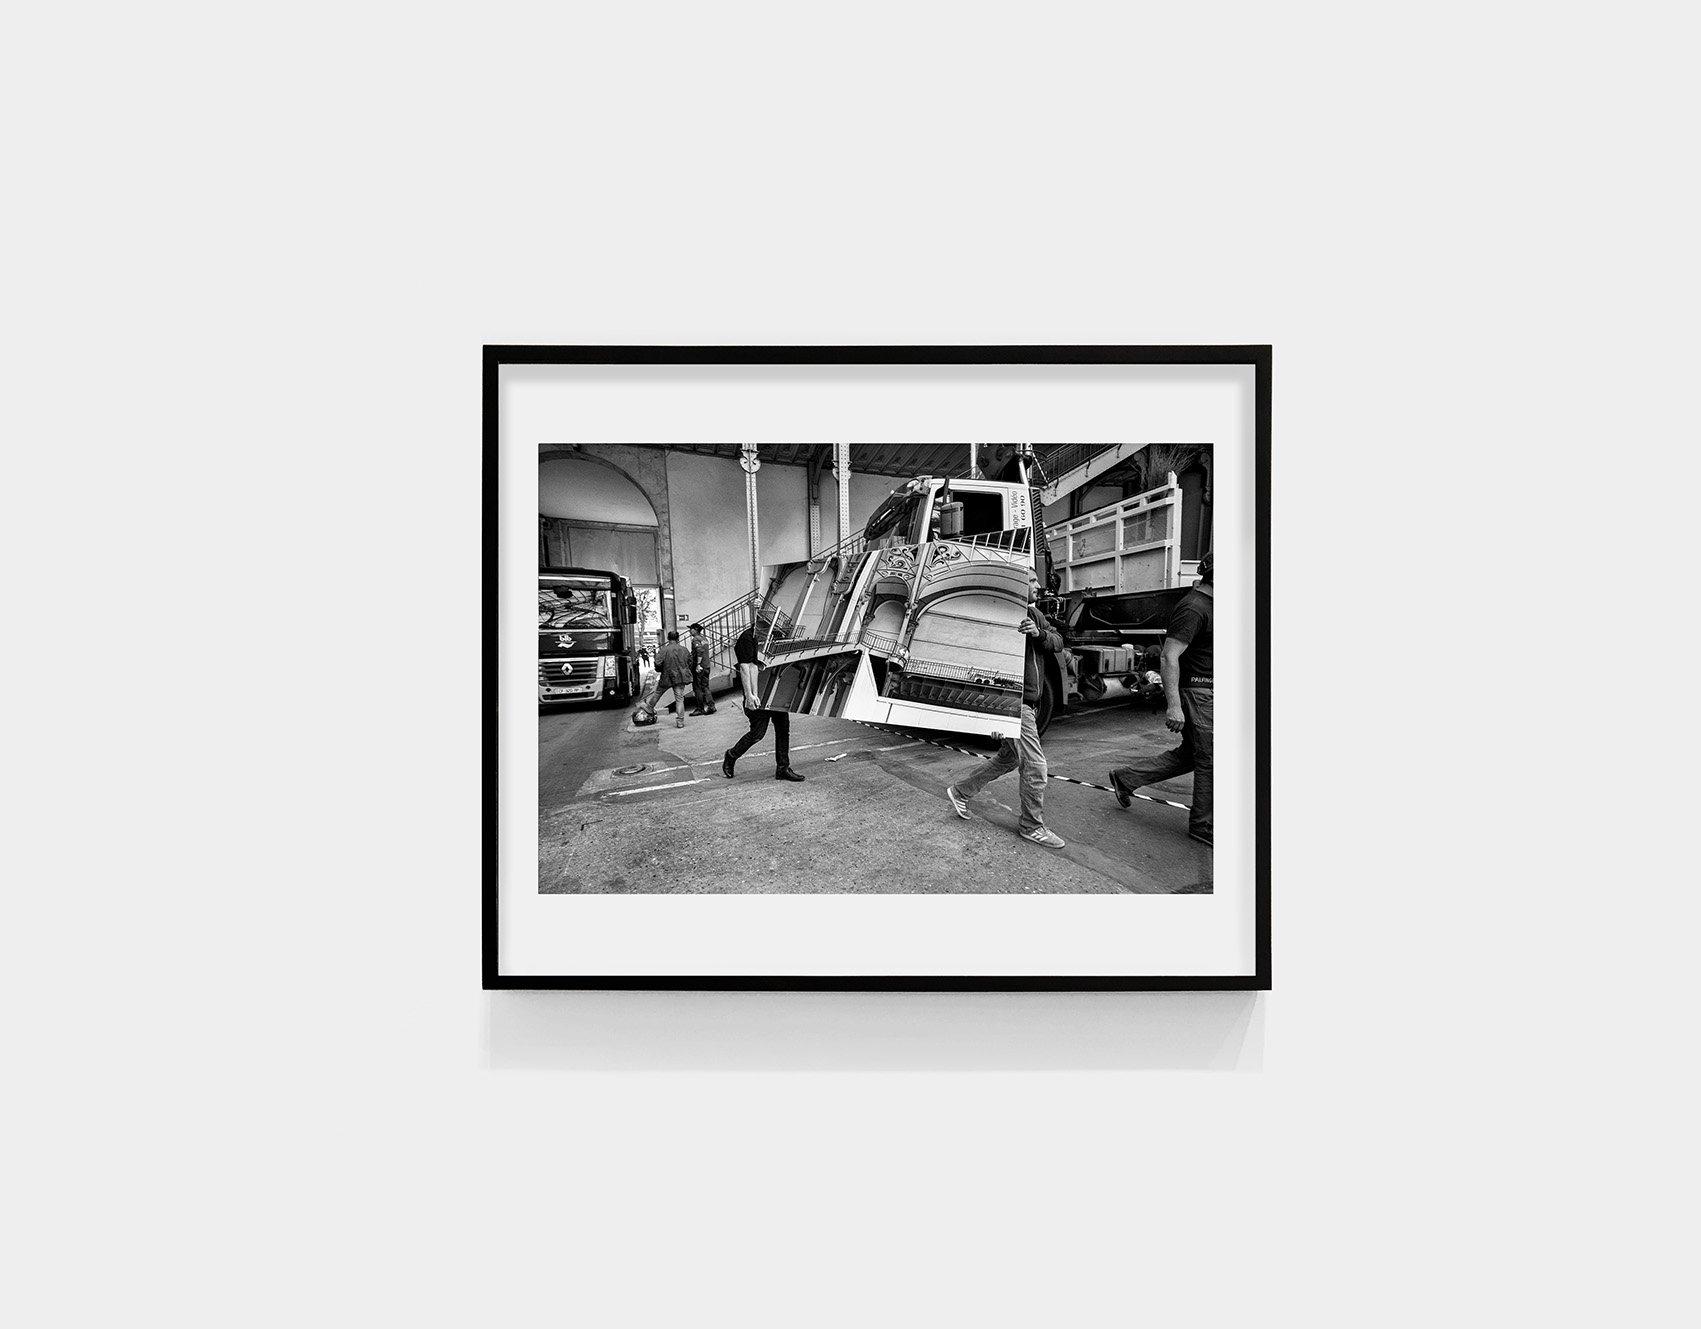 Tirage_Laurent_Delhourme_GrandPalais-3